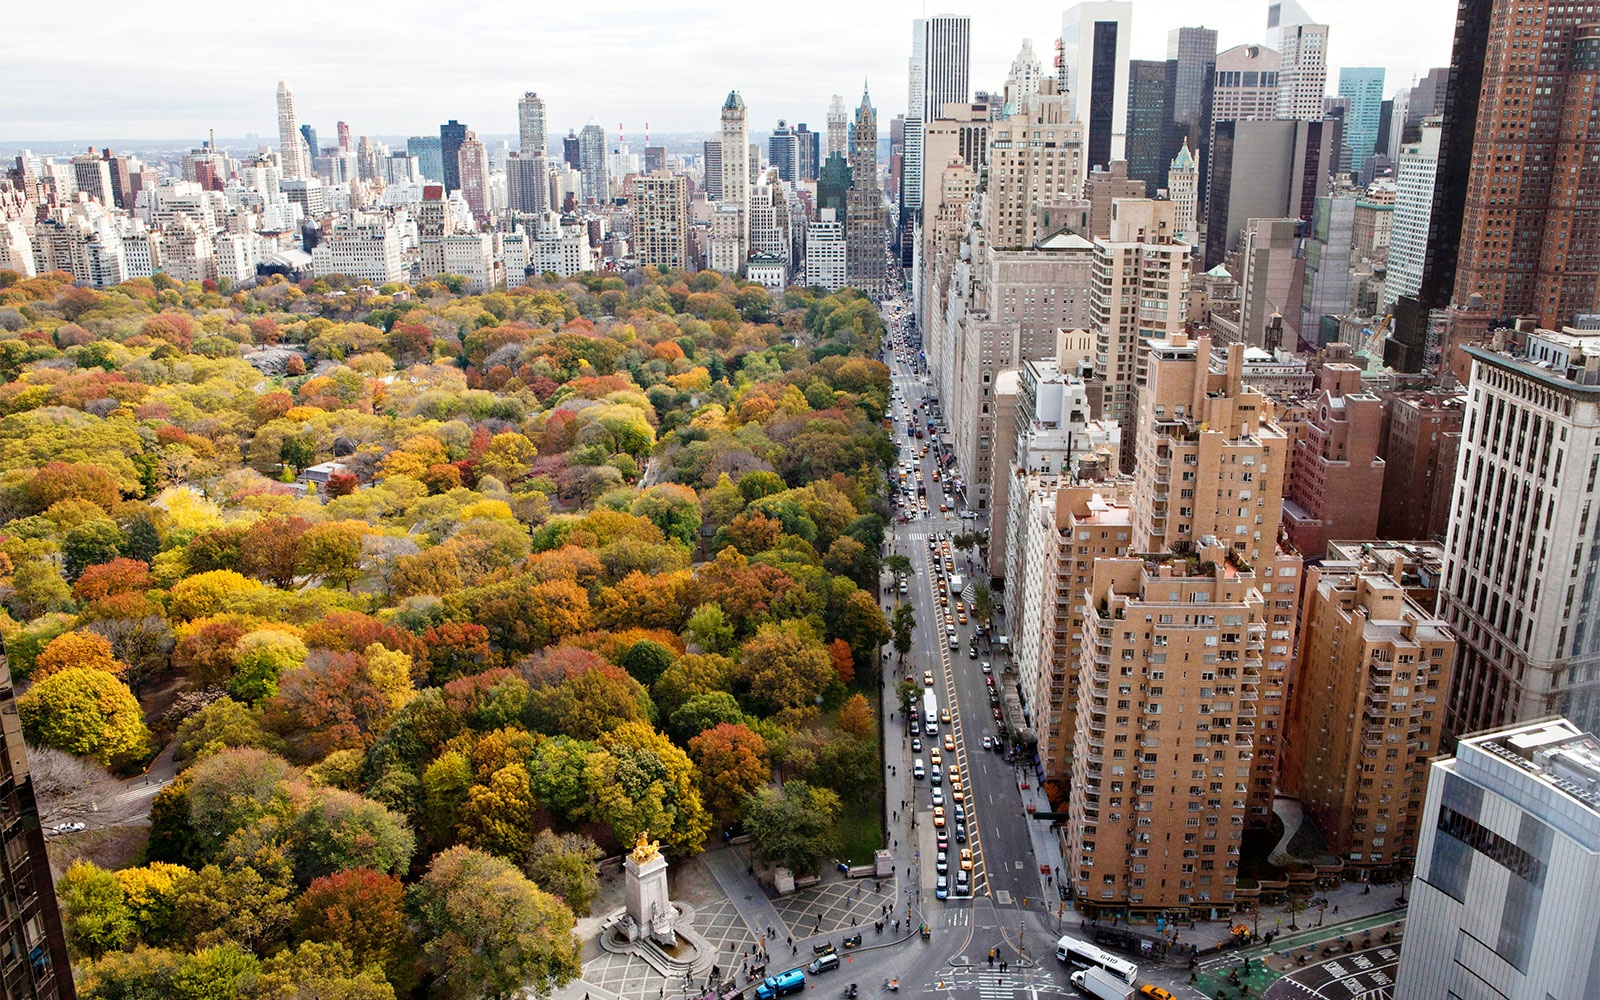 201408-w-americas-best-cities-for-fall-travel-new-york-new-york-centarl-park-mandarin-oriental.jpg